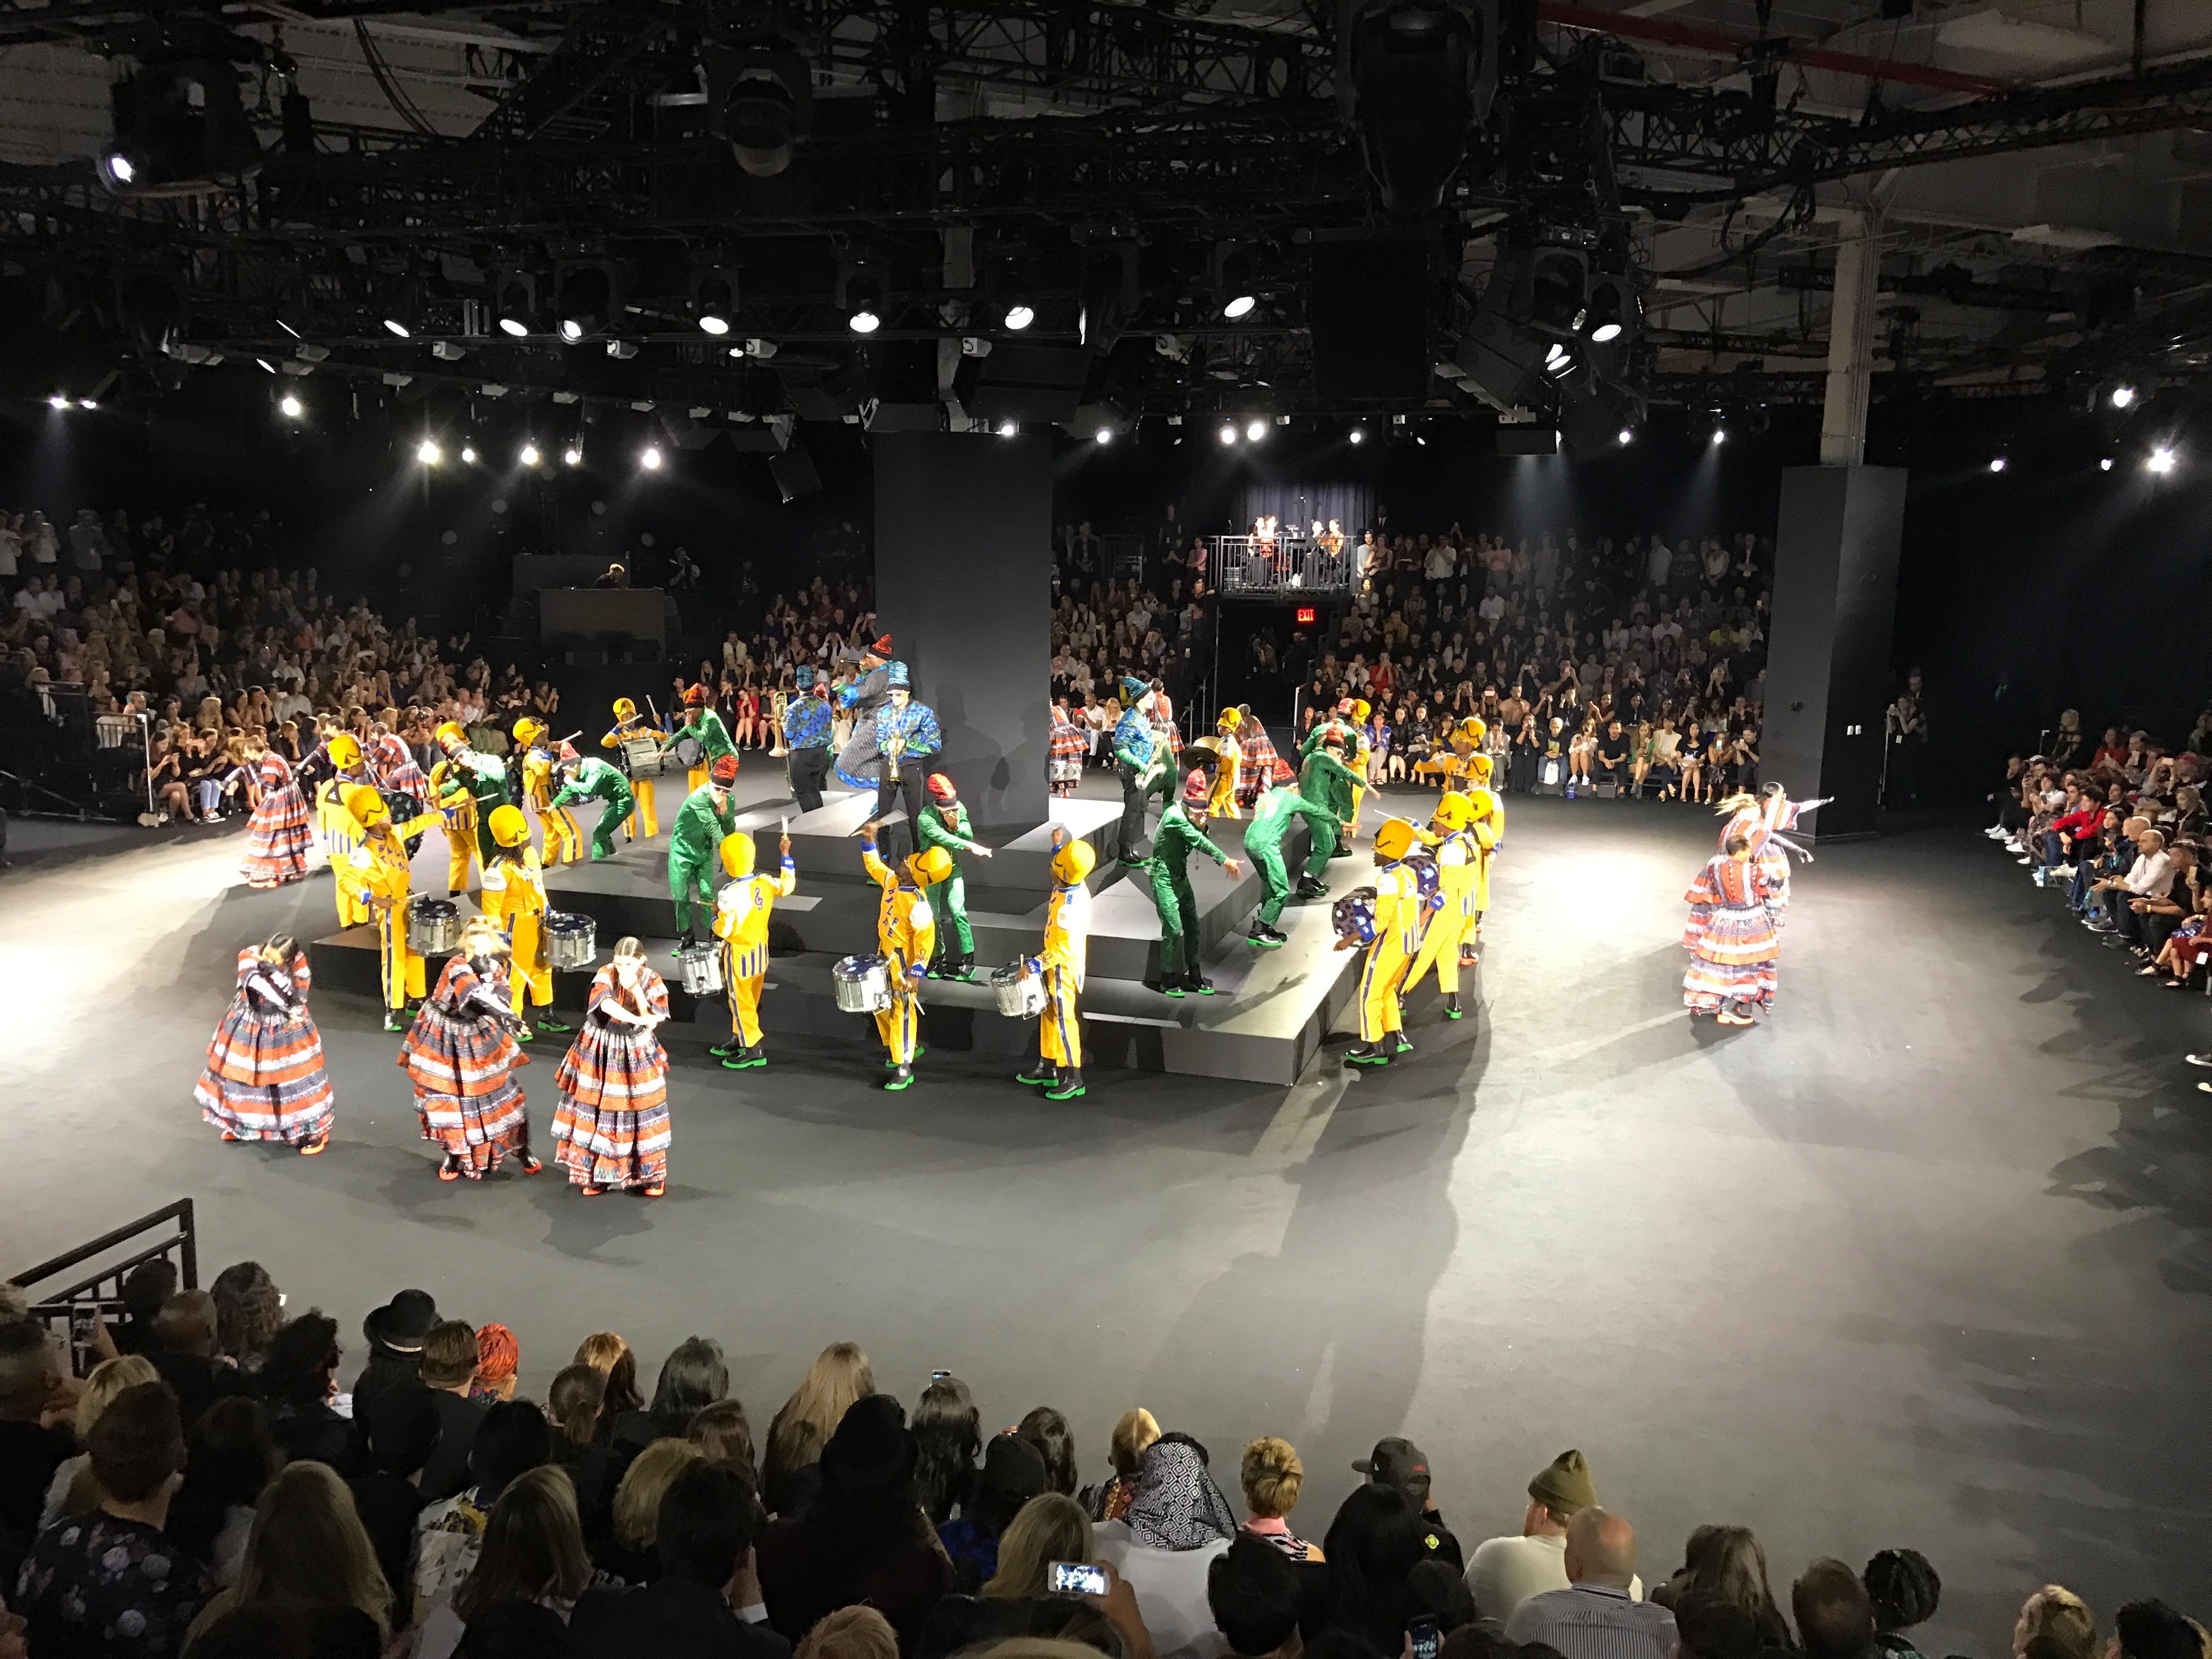 Kenzo x H&M Fashion Show